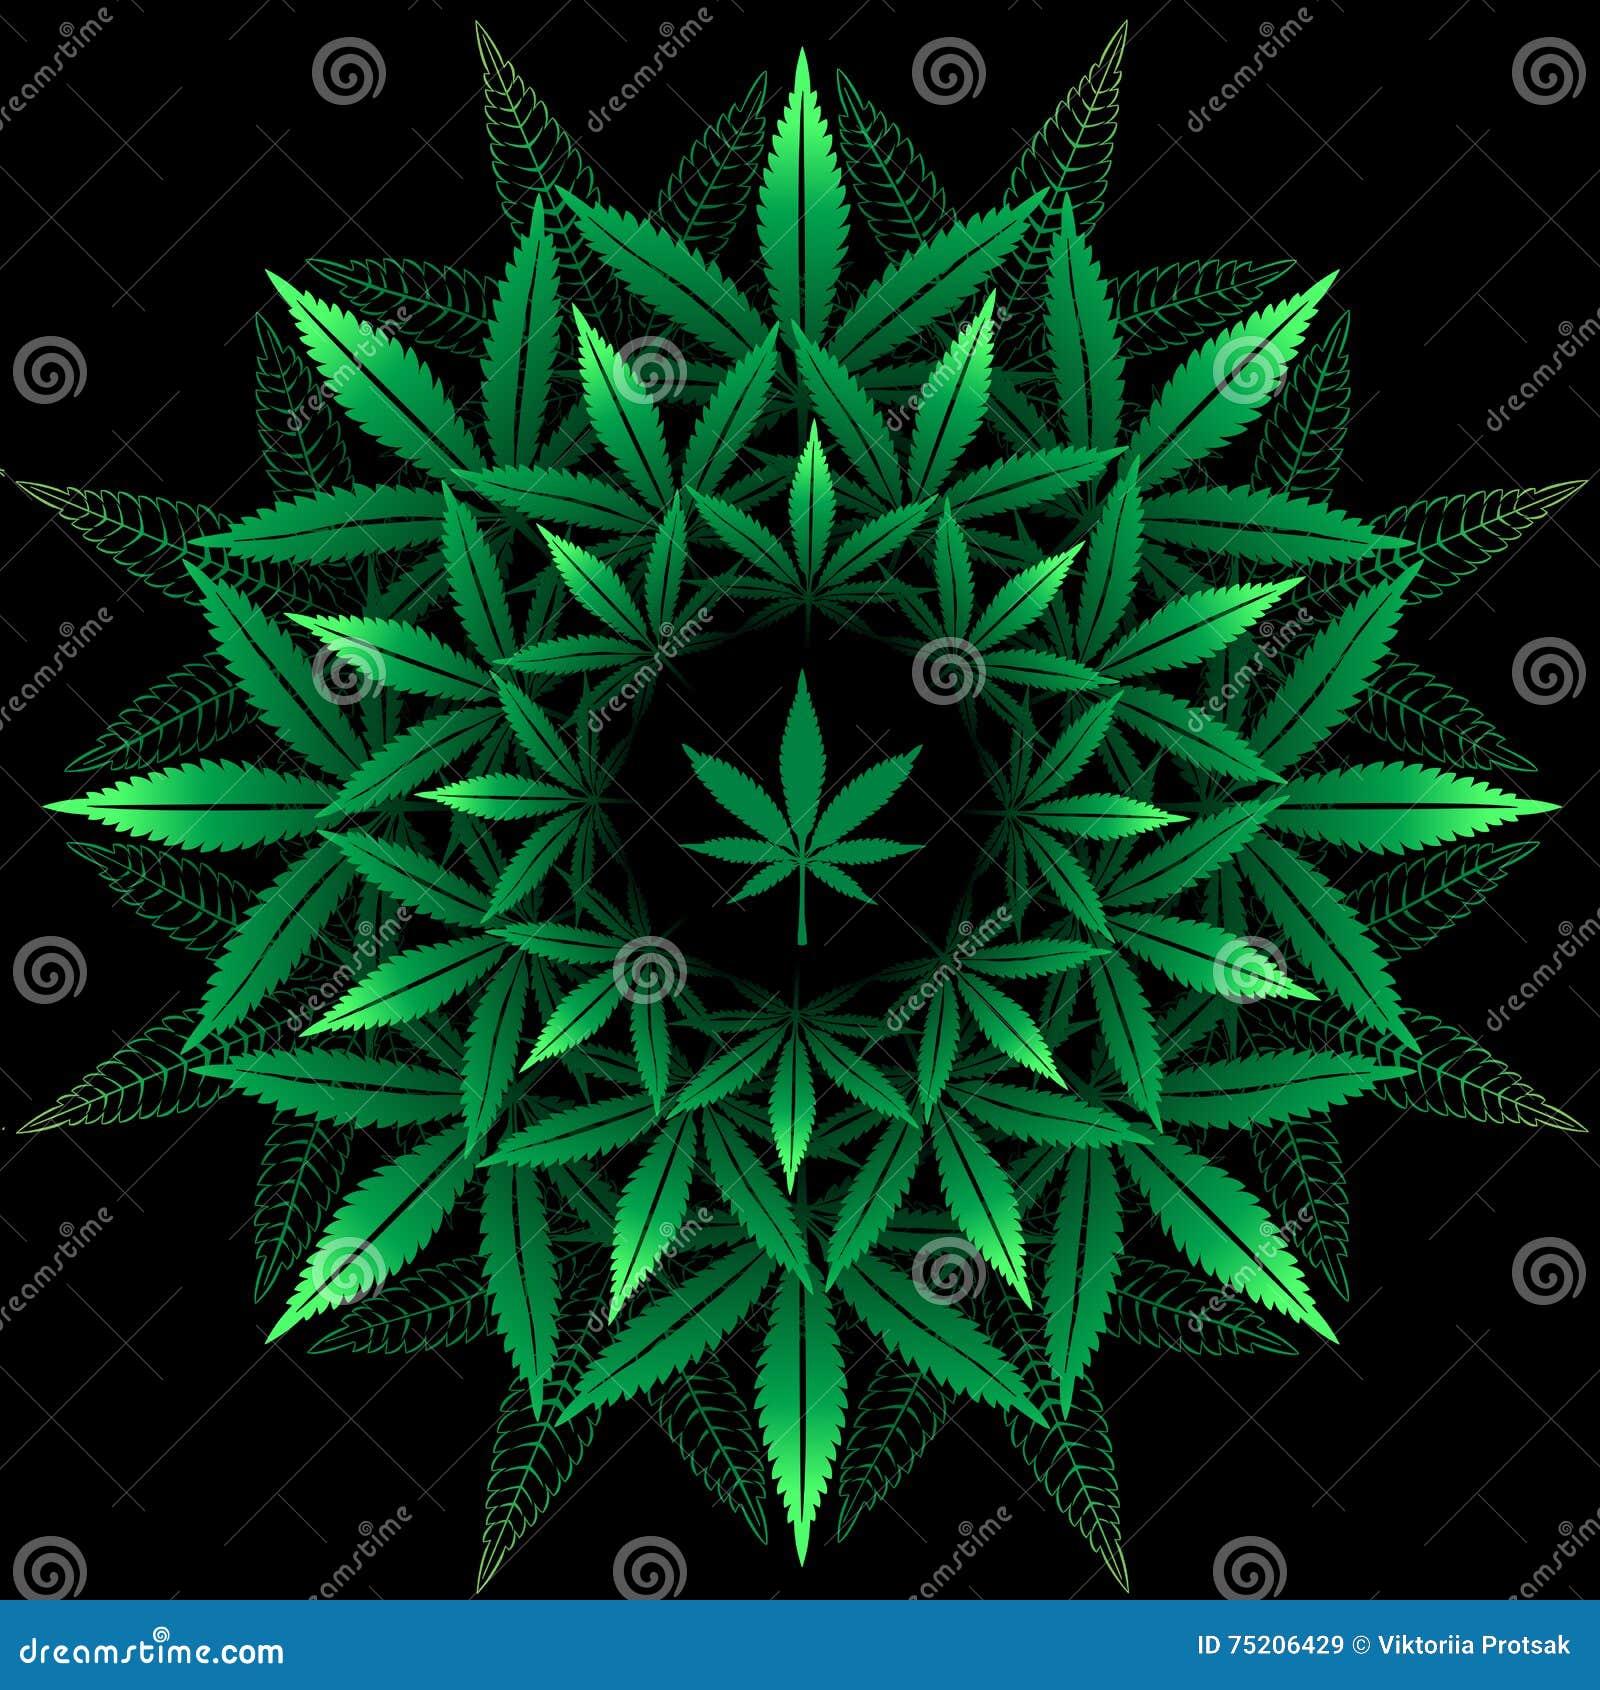 Конопля круглая картинка цветок похож на коноплю